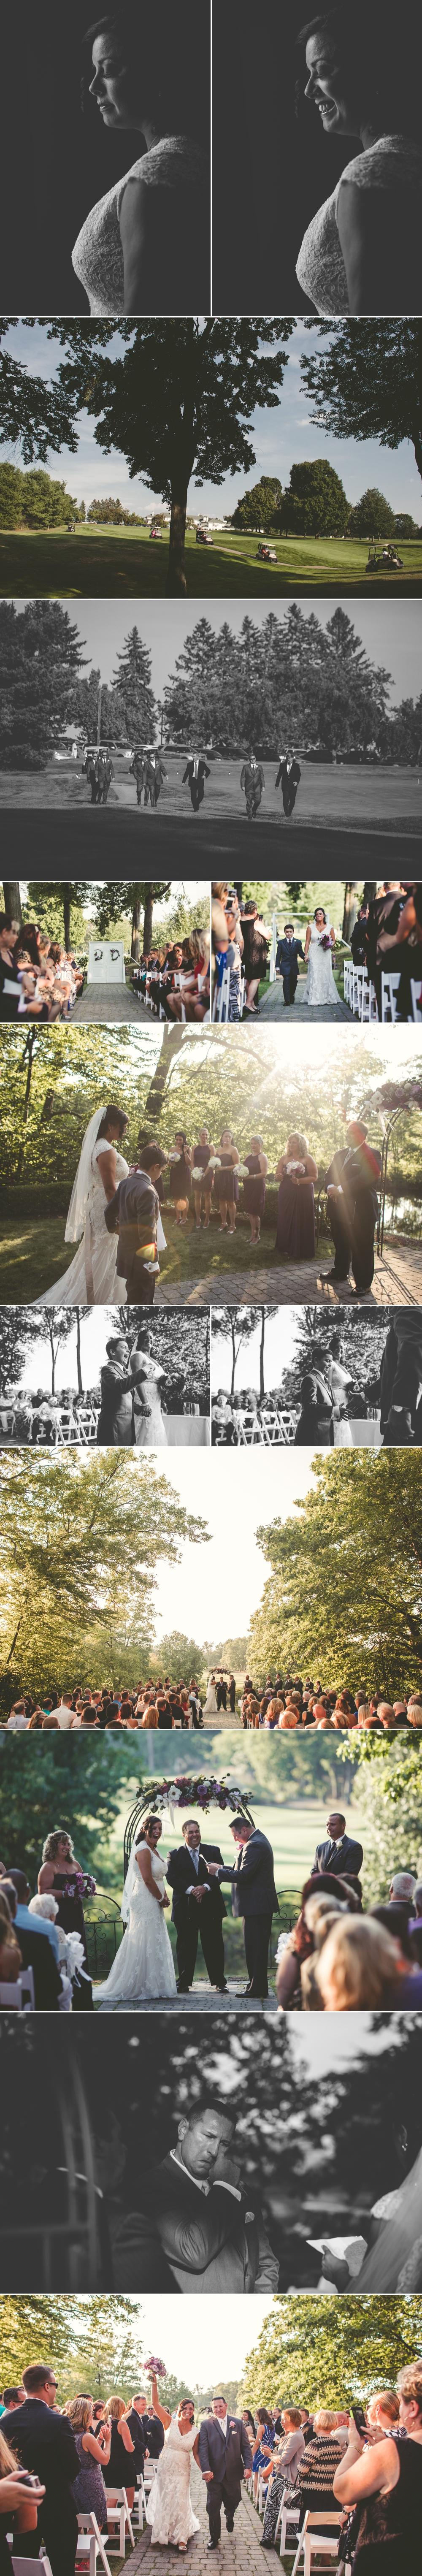 jason_domingues_photography_best_photographer_kansas_city_kc_wedding_engagement_rhode_island_massachusetts_destination_creative_documentary_portraits_experienced_weddings_2